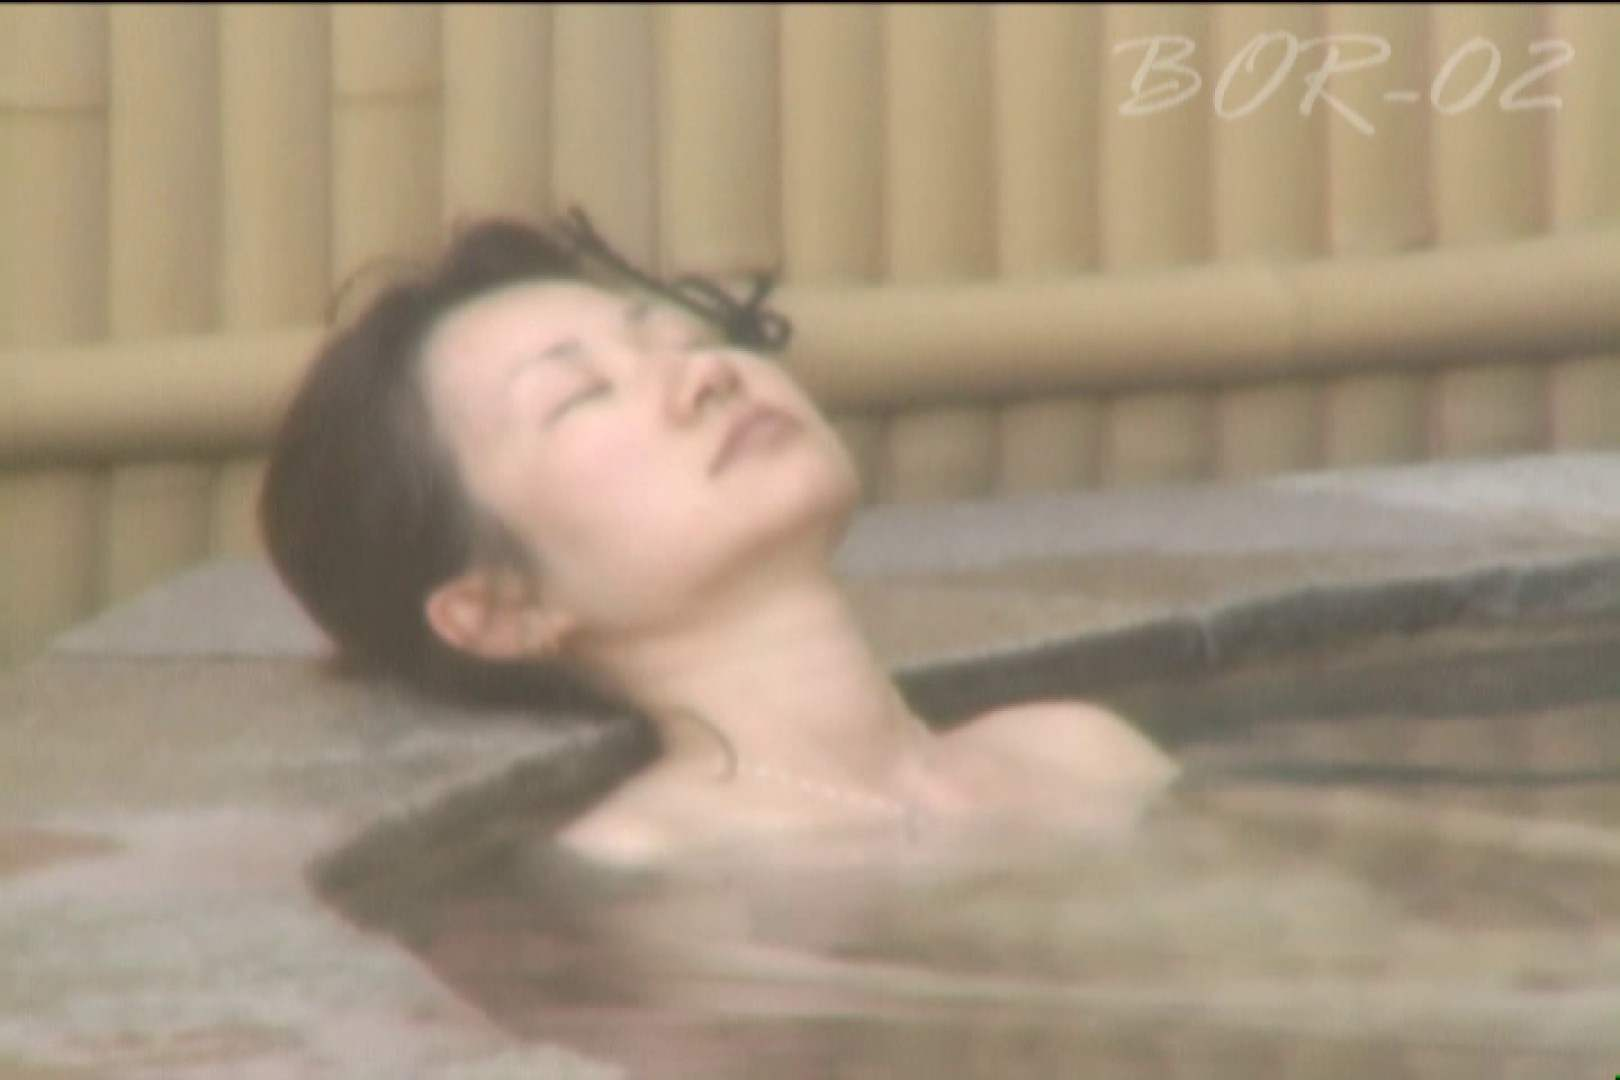 Aquaな露天風呂Vol.477 盗撮  79連発 51